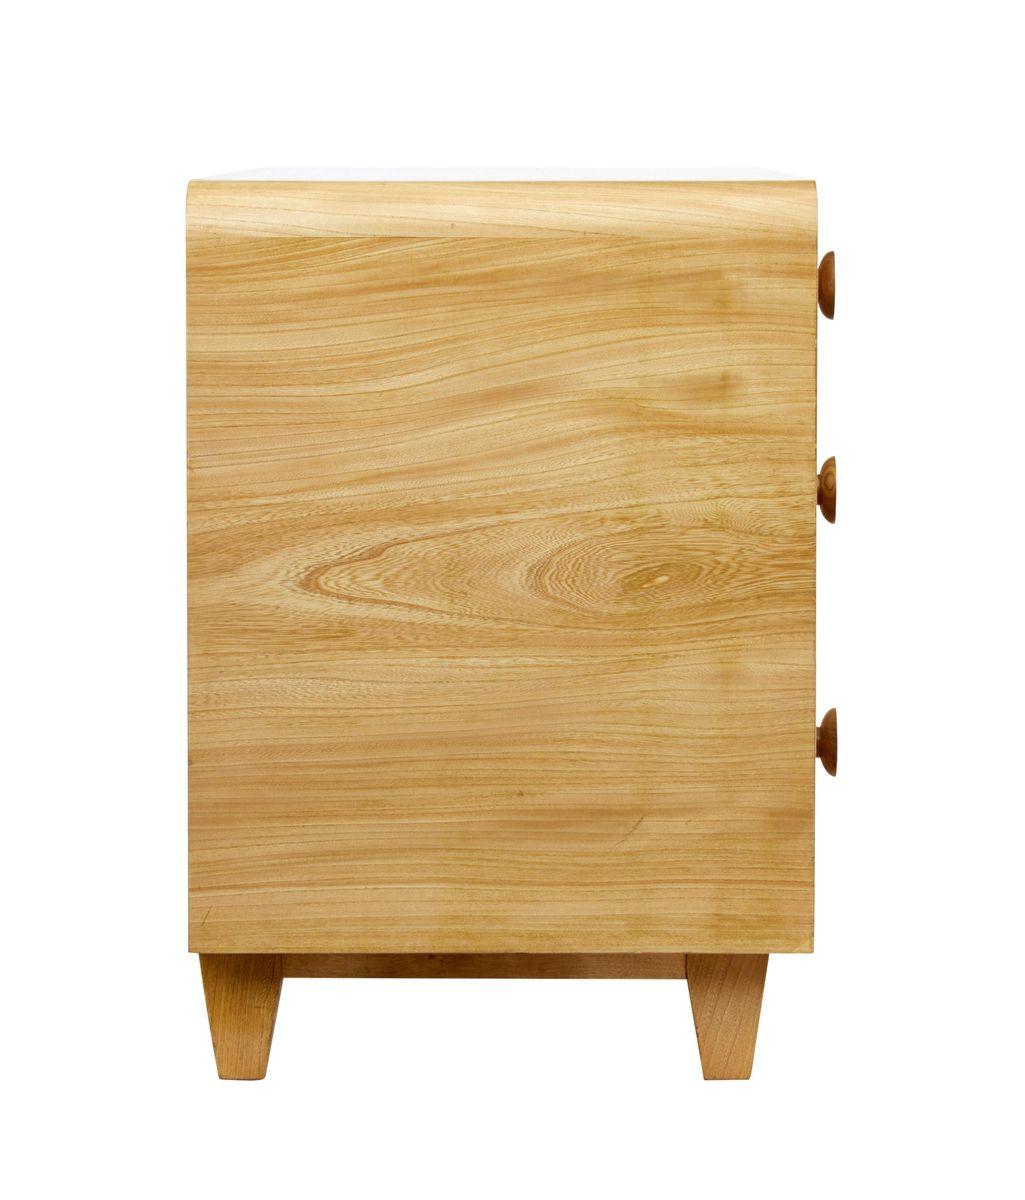 mid century kommode aus ulmenholz bei pamono kaufen. Black Bedroom Furniture Sets. Home Design Ideas